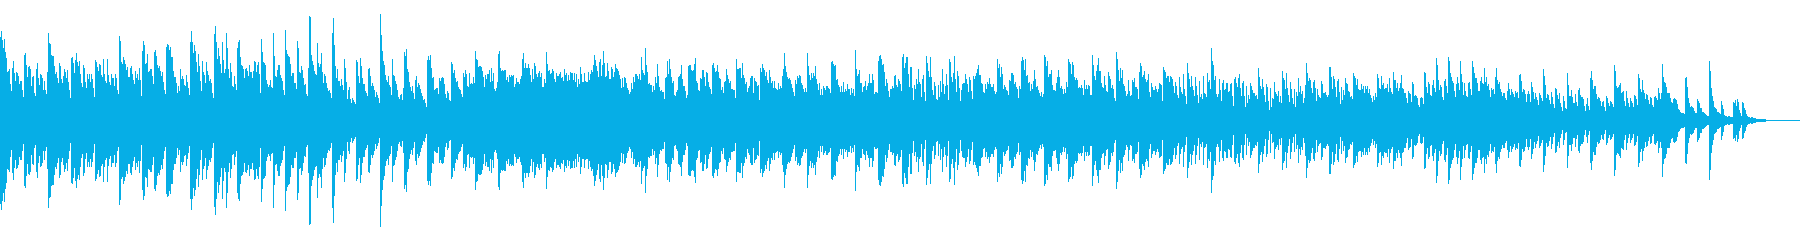 KANTピアノソロ穏やかな時間BGMの再生済みの波形